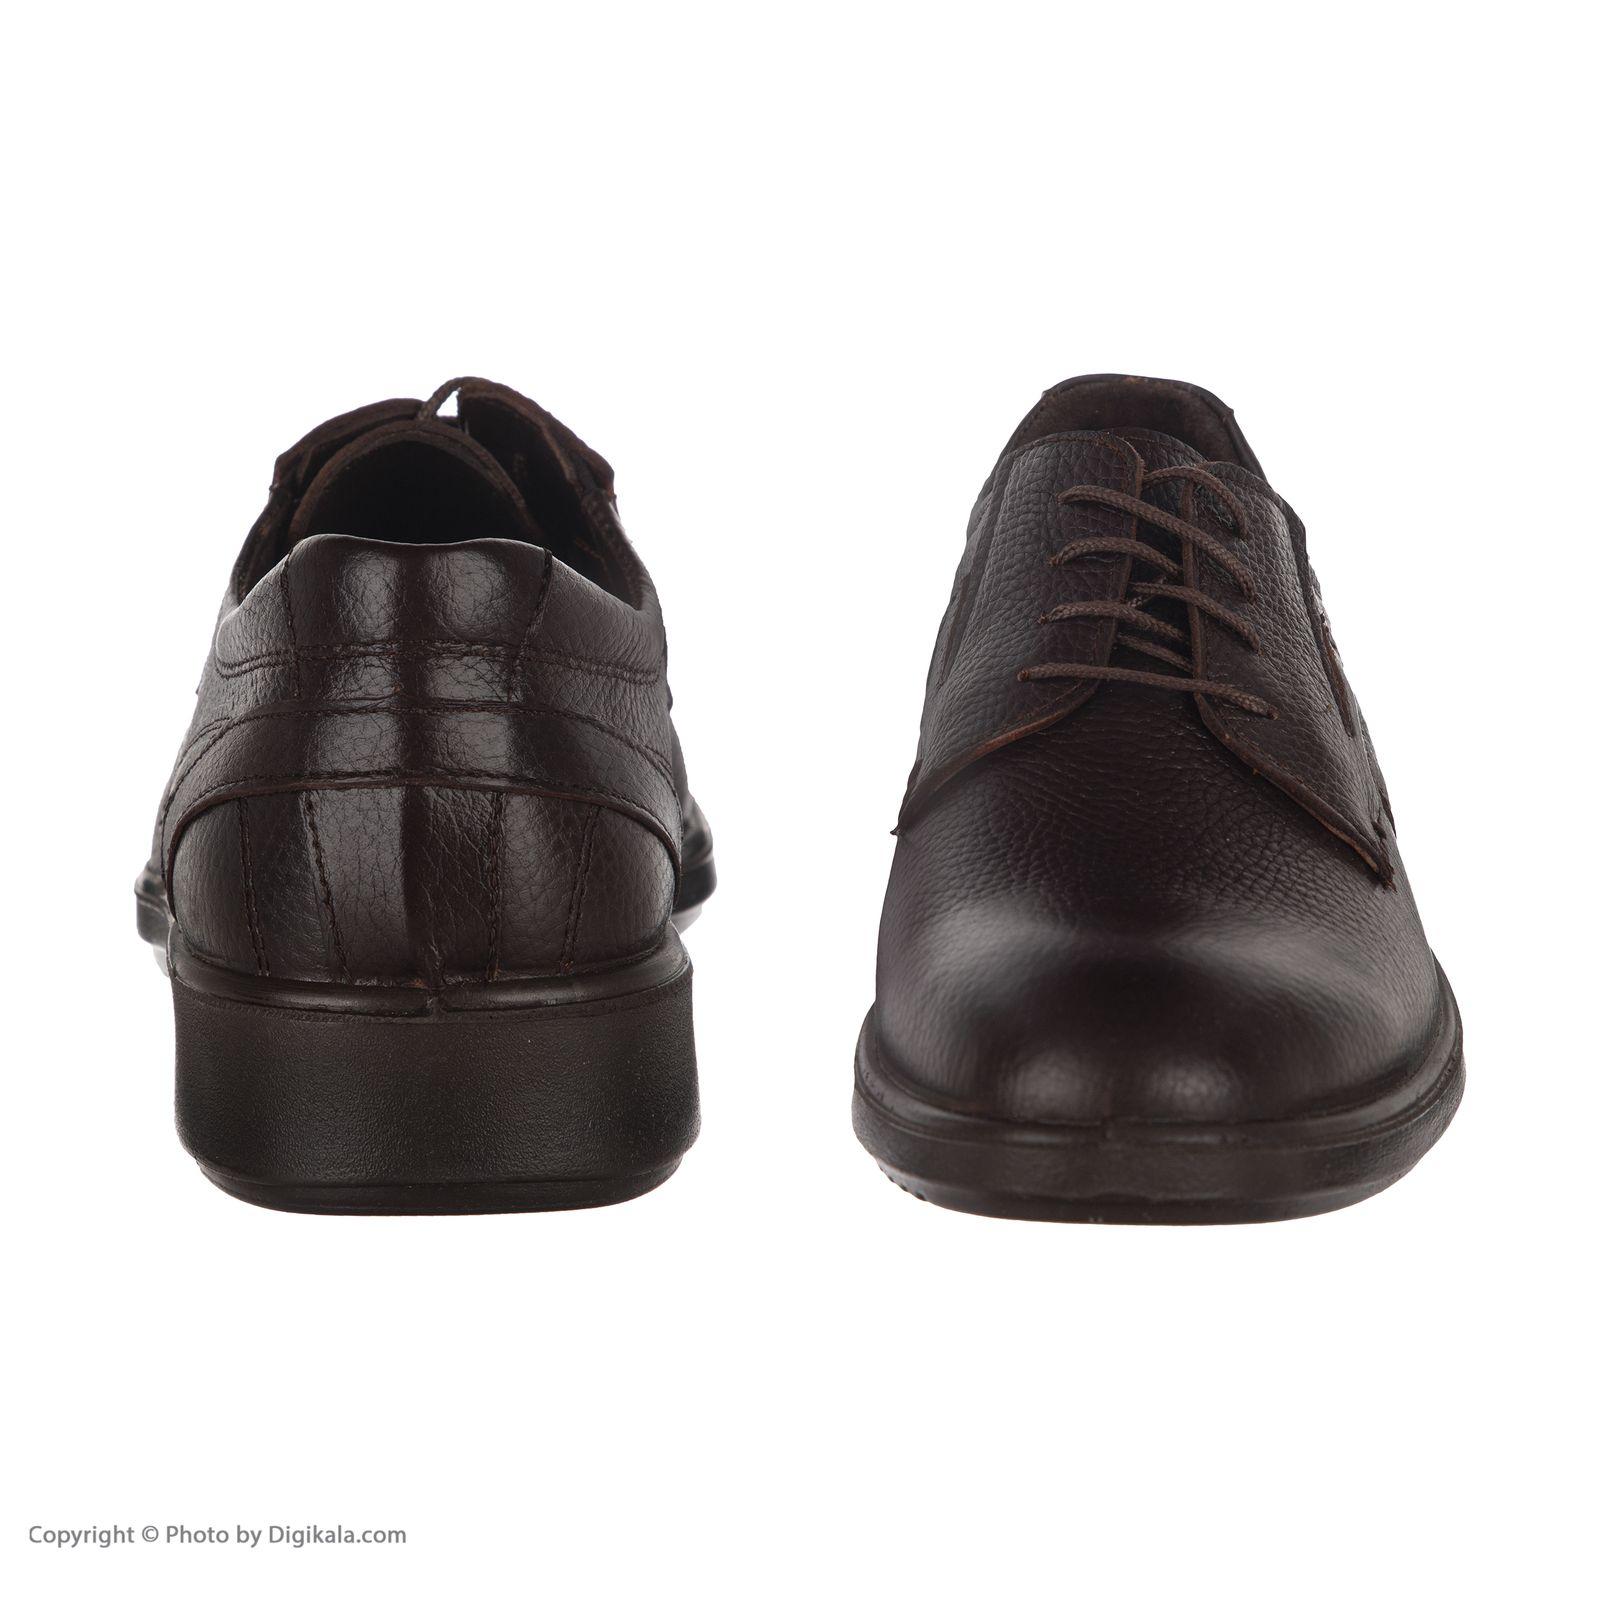 کفش روزمره مردانه آذر پلاس مدل 9438B503104 -  - 4